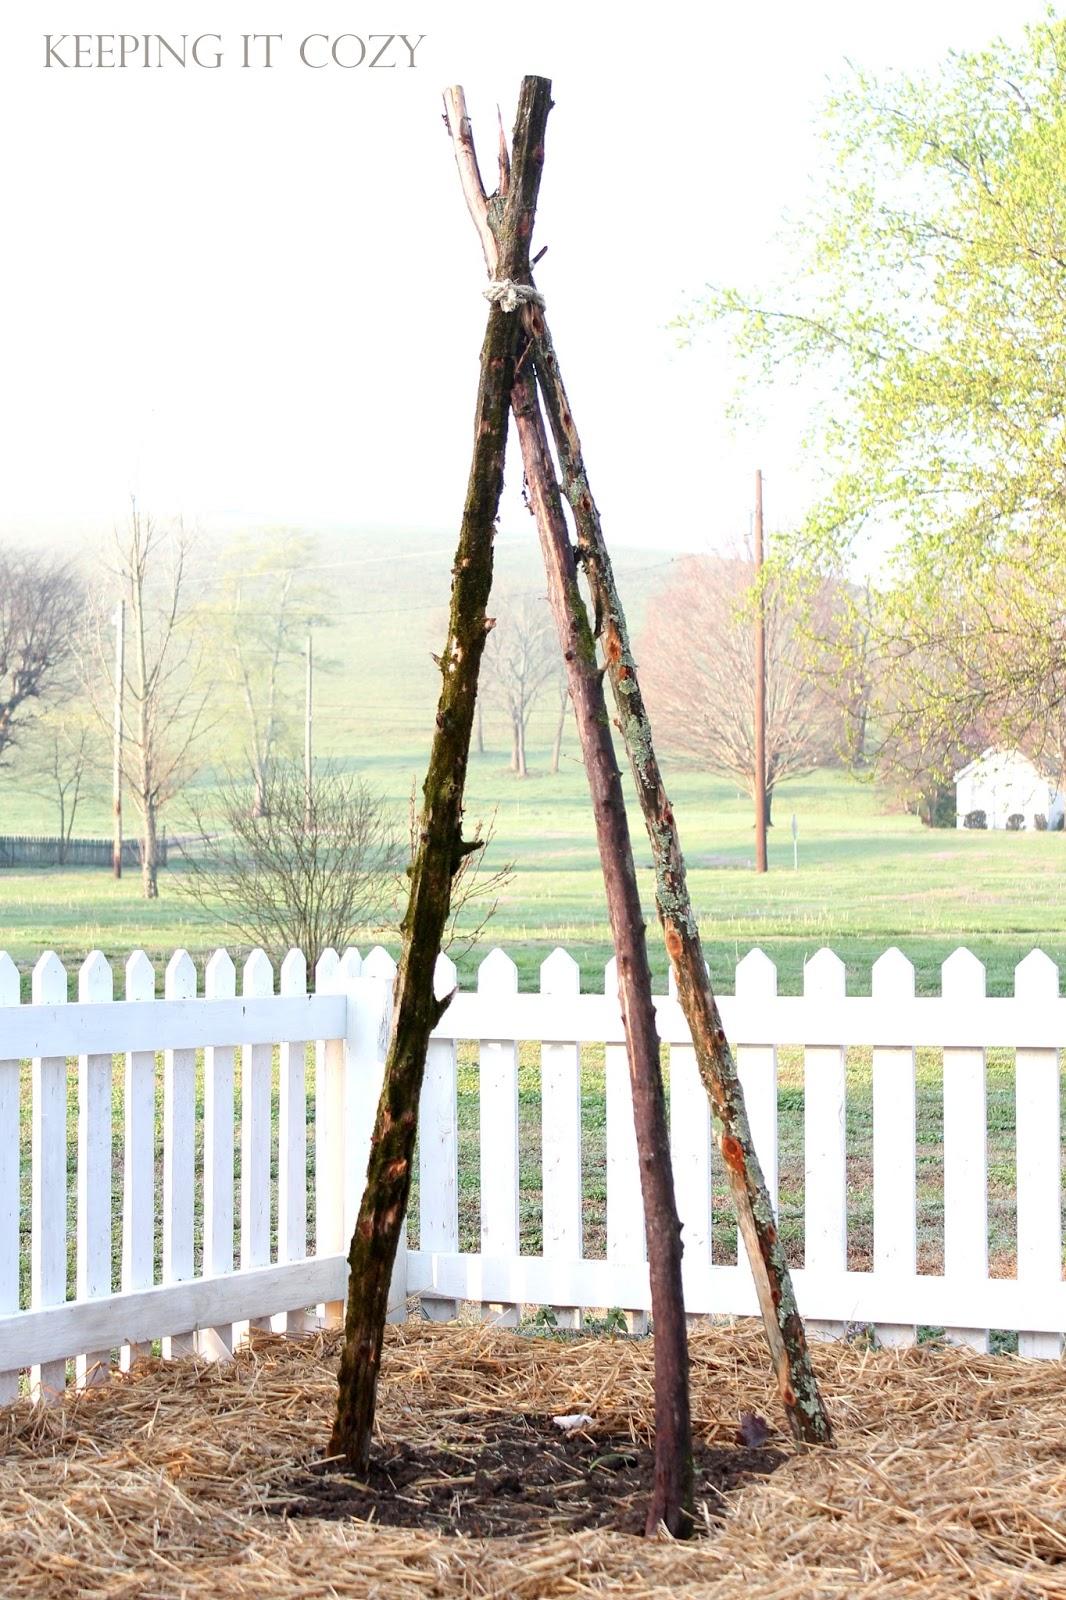 Keeping It Cozy Cedar Poles in the Garden